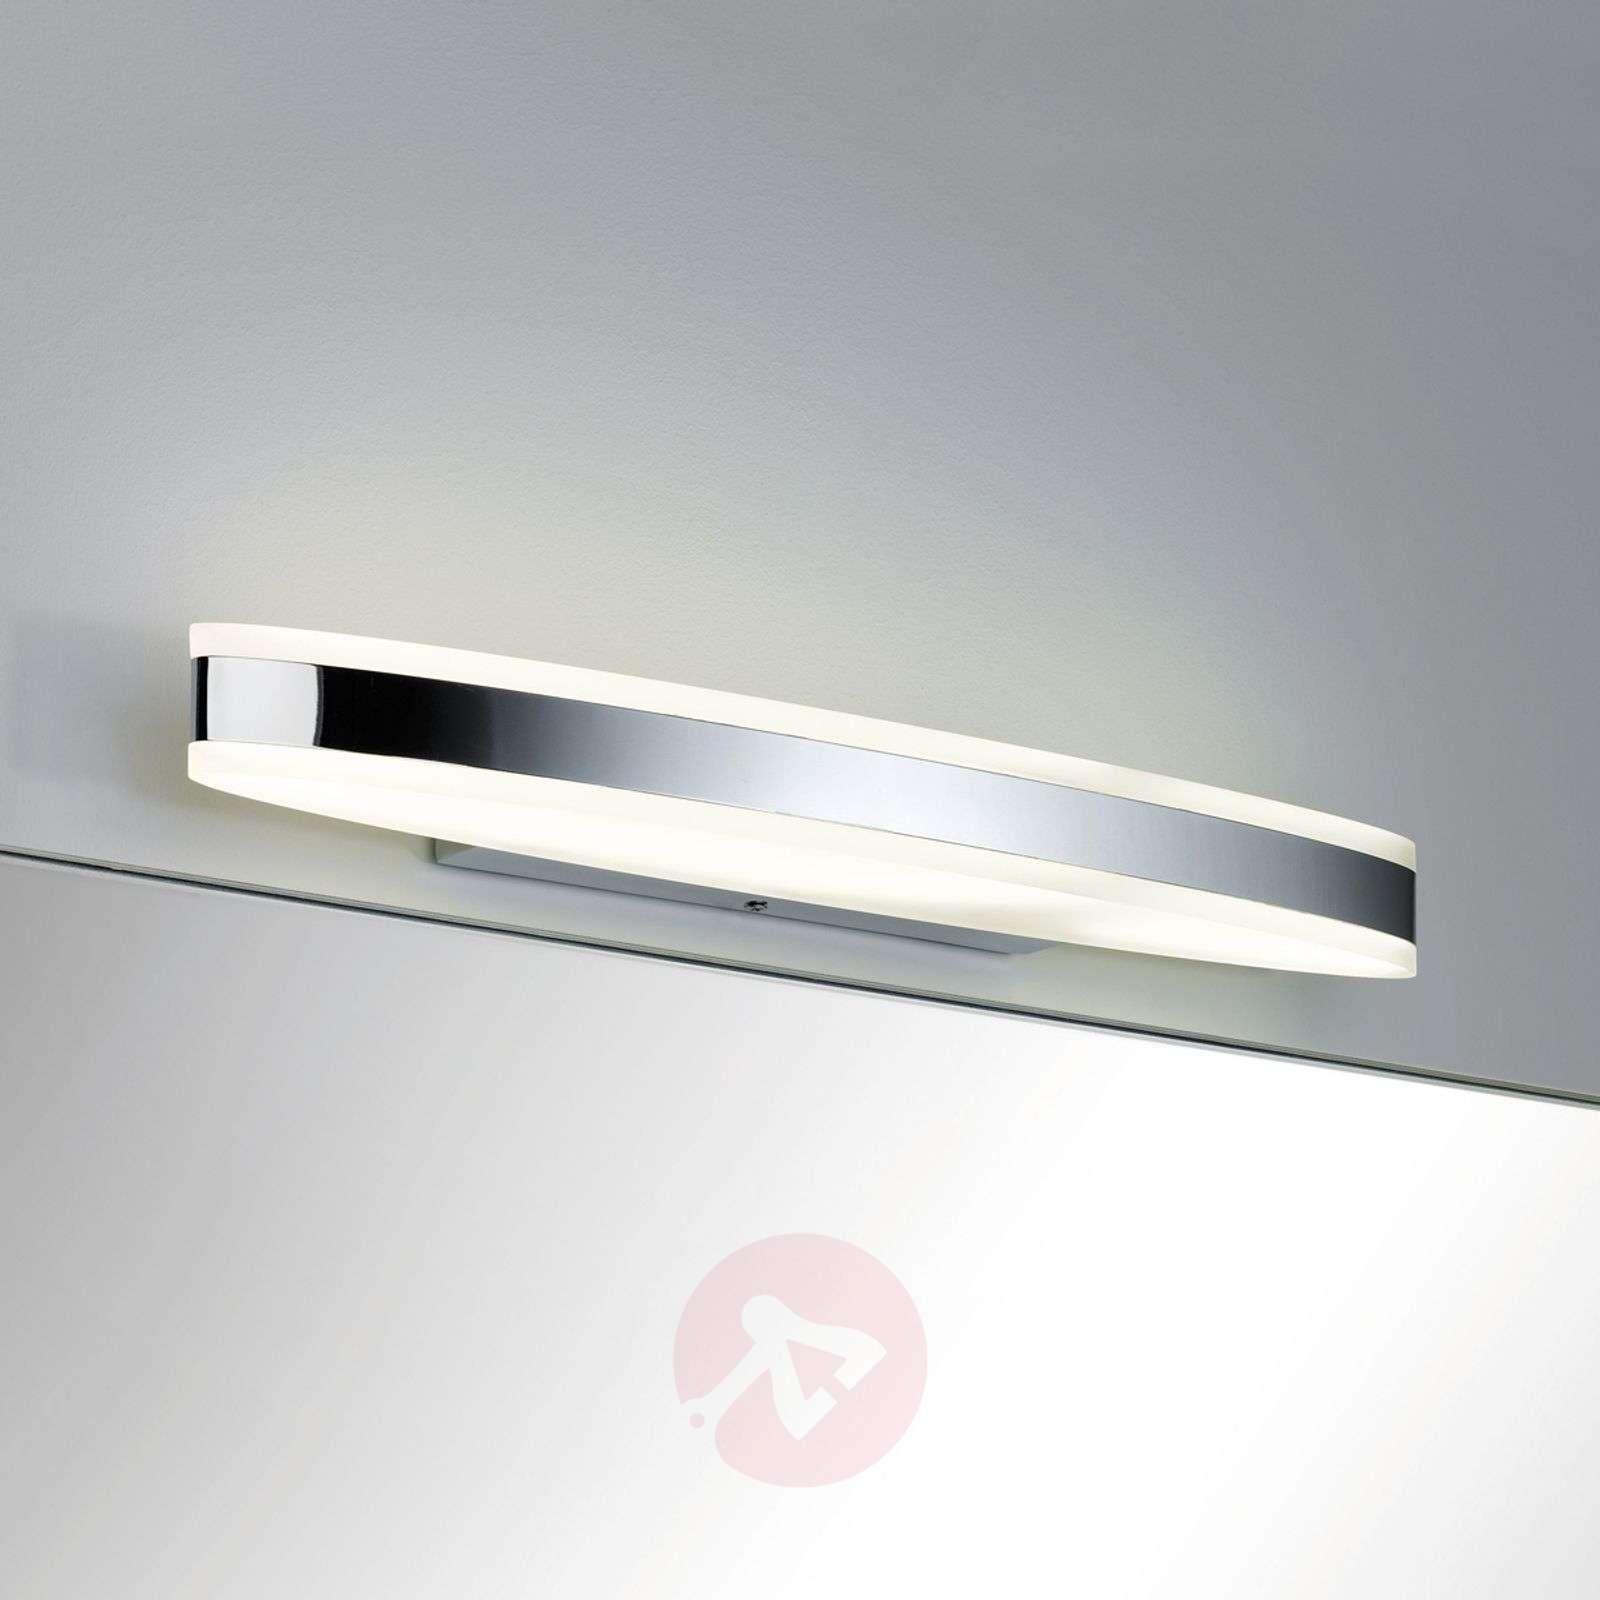 Long LED wall light Kuma-7600673-01